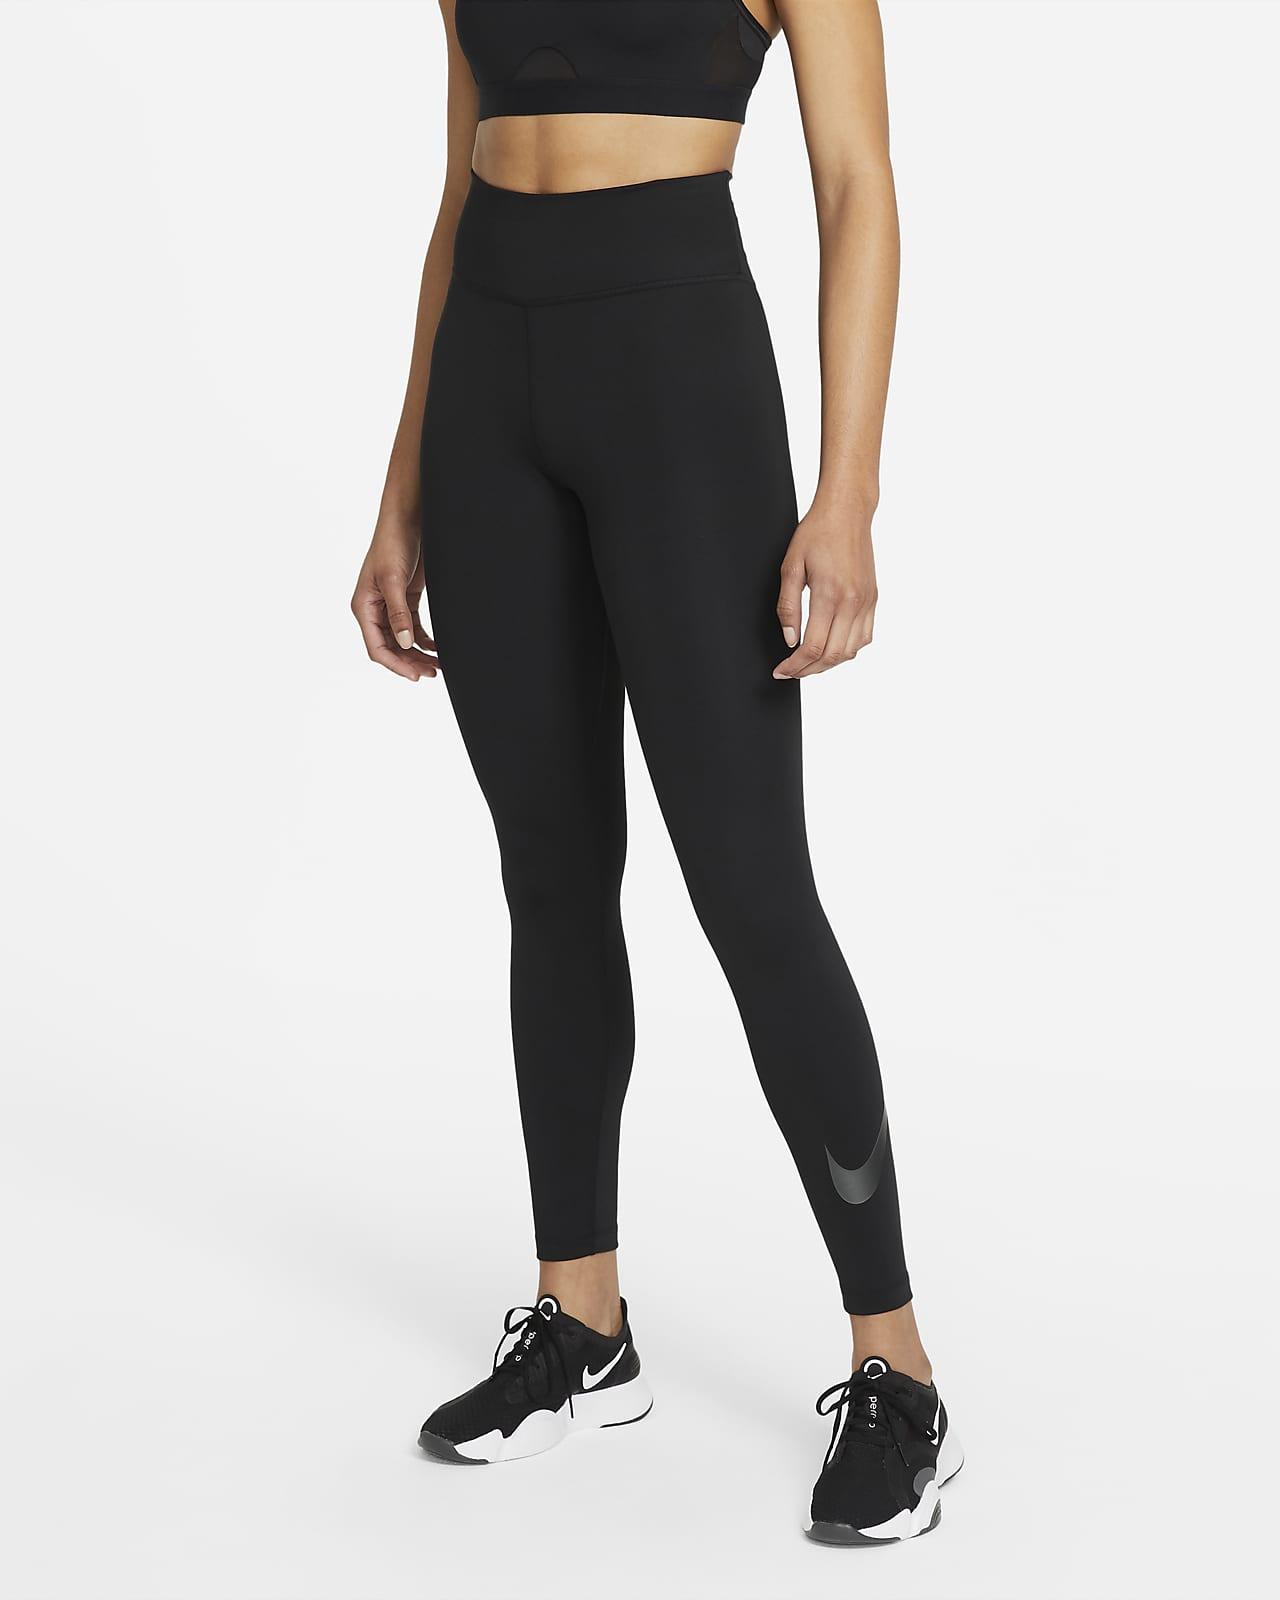 Nike One Icon Clash Women's Mid-Rise 7/8 Graphic Leggings